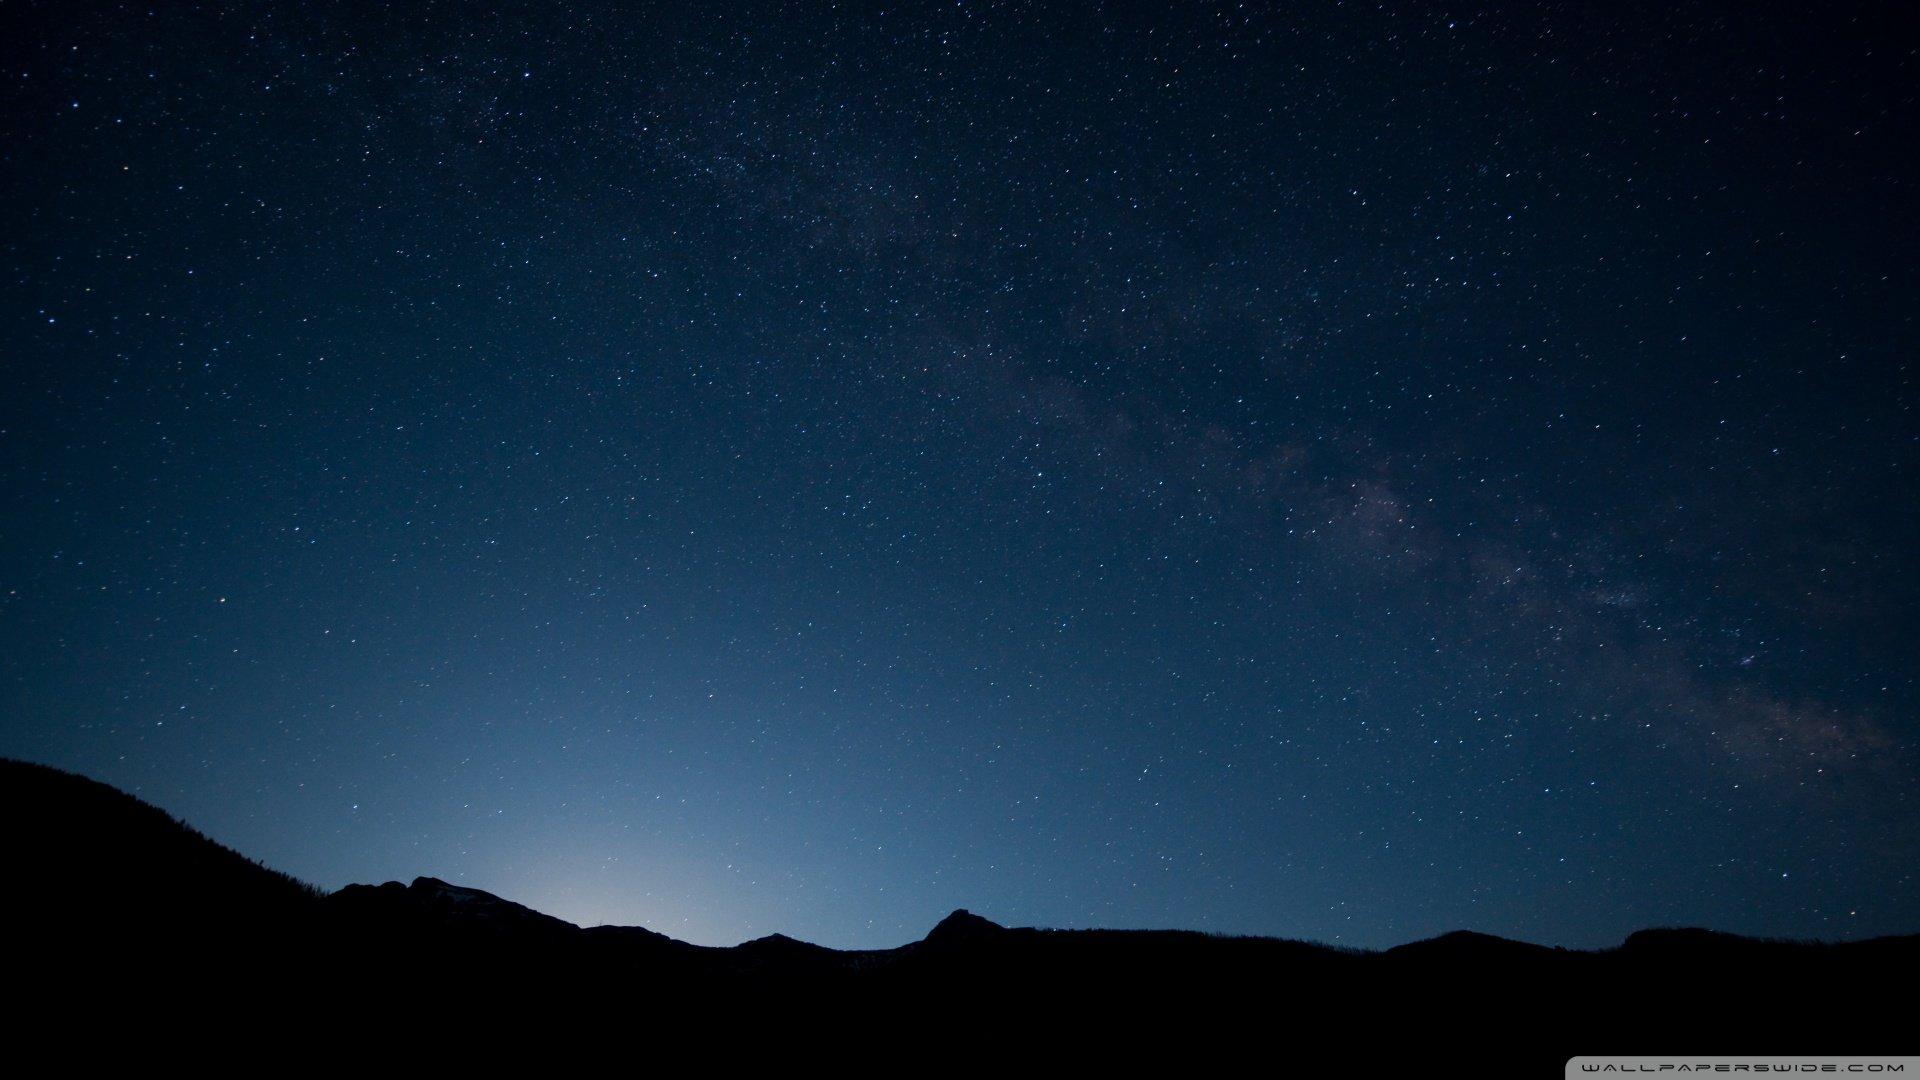 Night Sky 3 Wallpaper 1920x1080 Night Sky 3 1920x1080